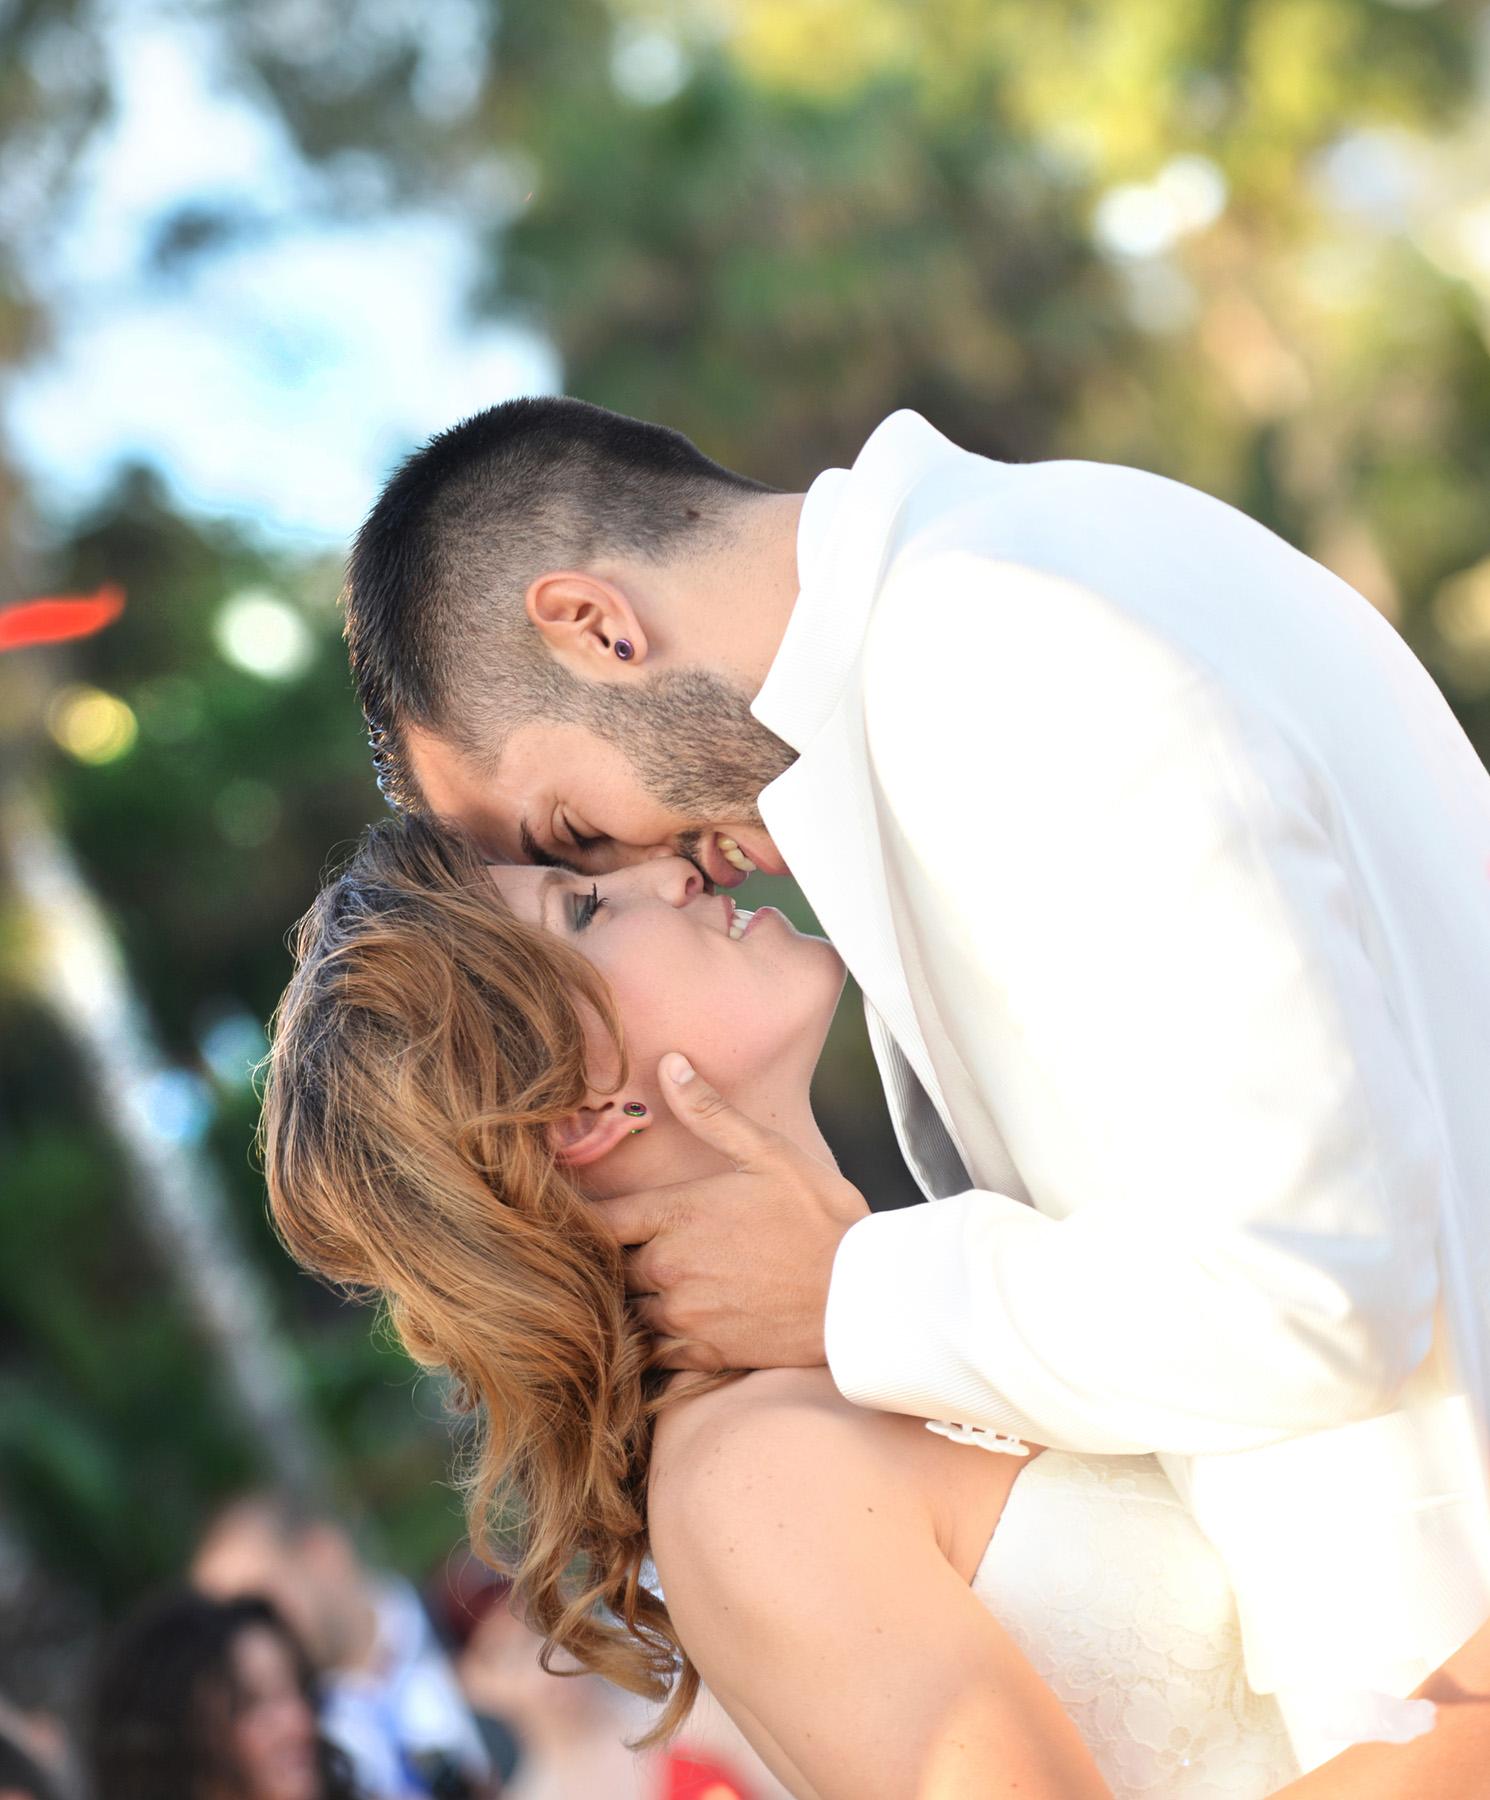 benalmadena fotografia de boda ceremonia en boda